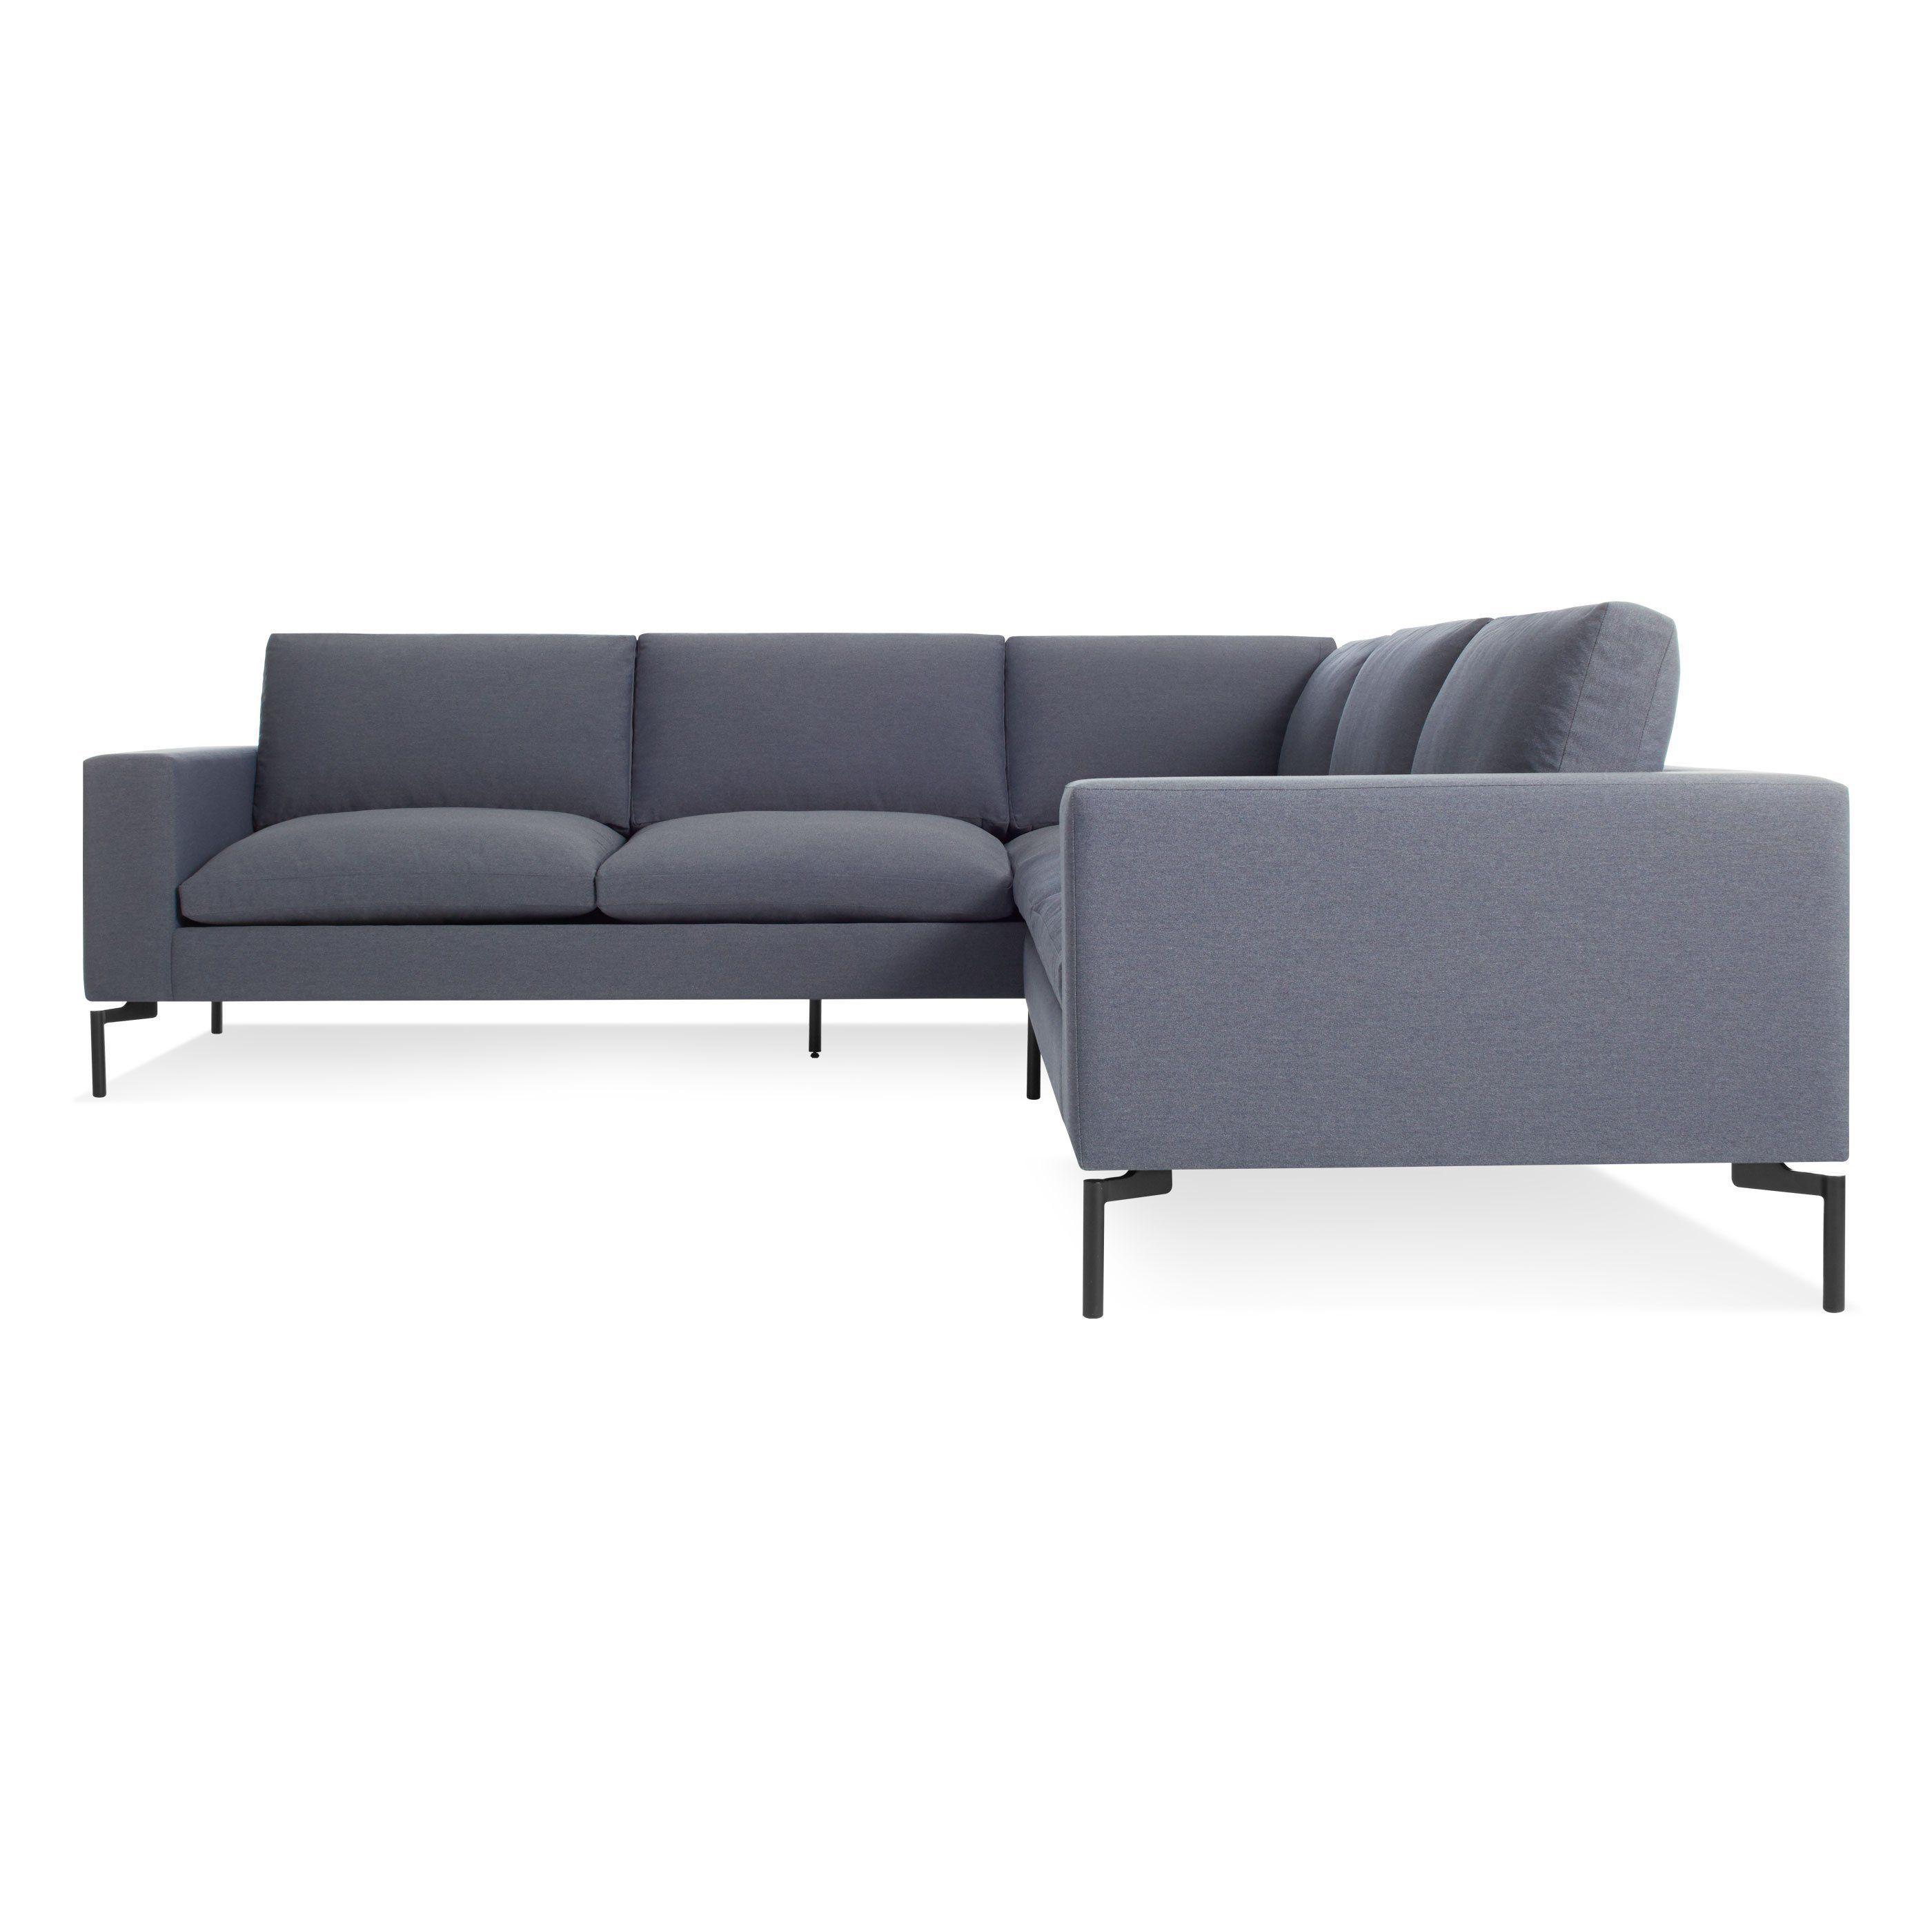 Blu Dot New Standard Left Sectional Sofa Small